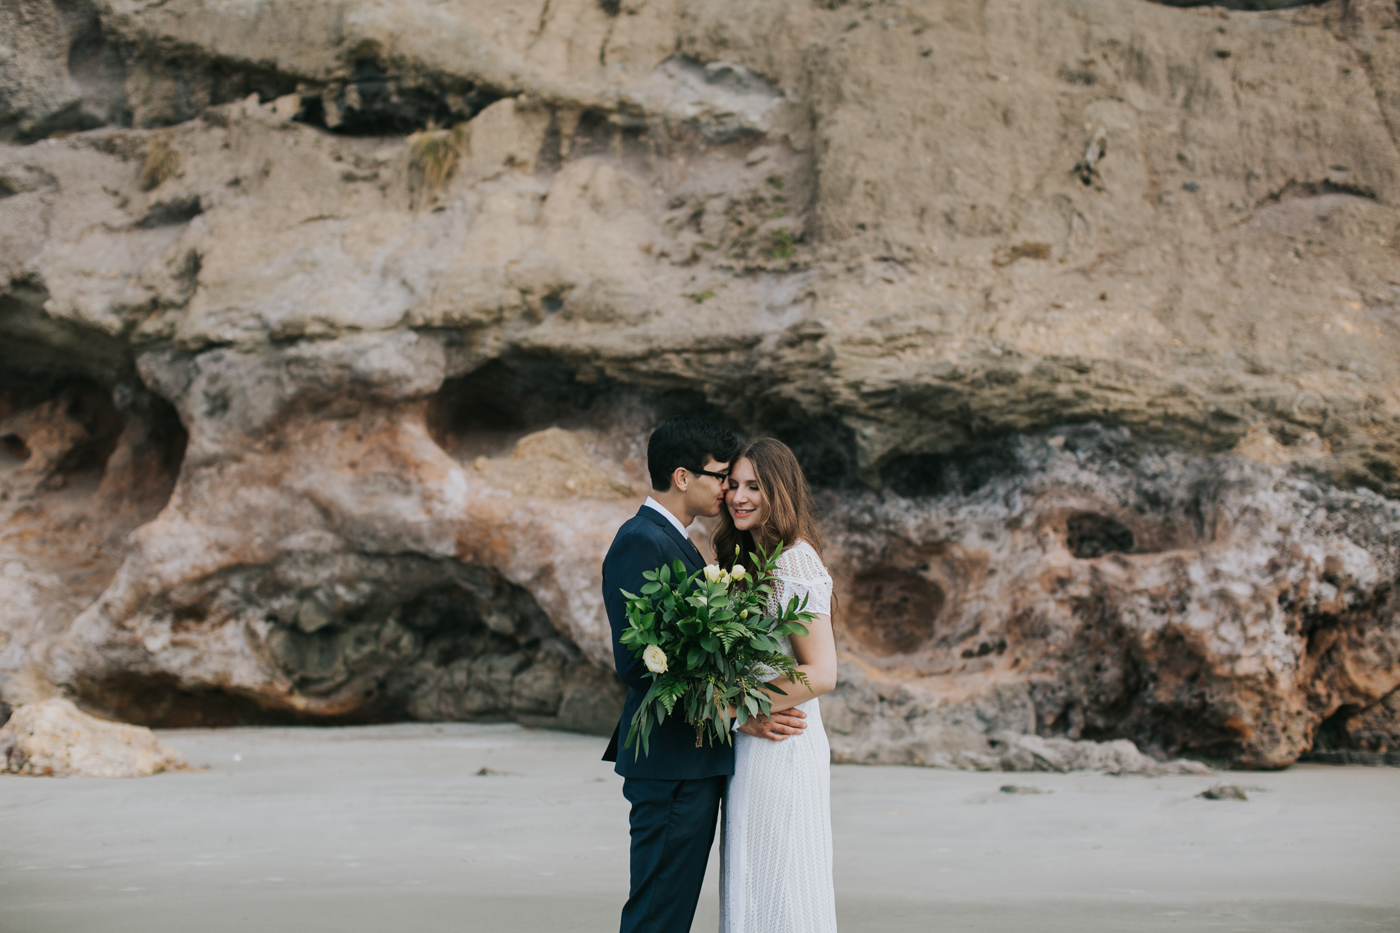 Ariana & Tim - Dunedin, New Zealand Wedding - Destination Wedding - Samantha Heather Photography-158.jpg